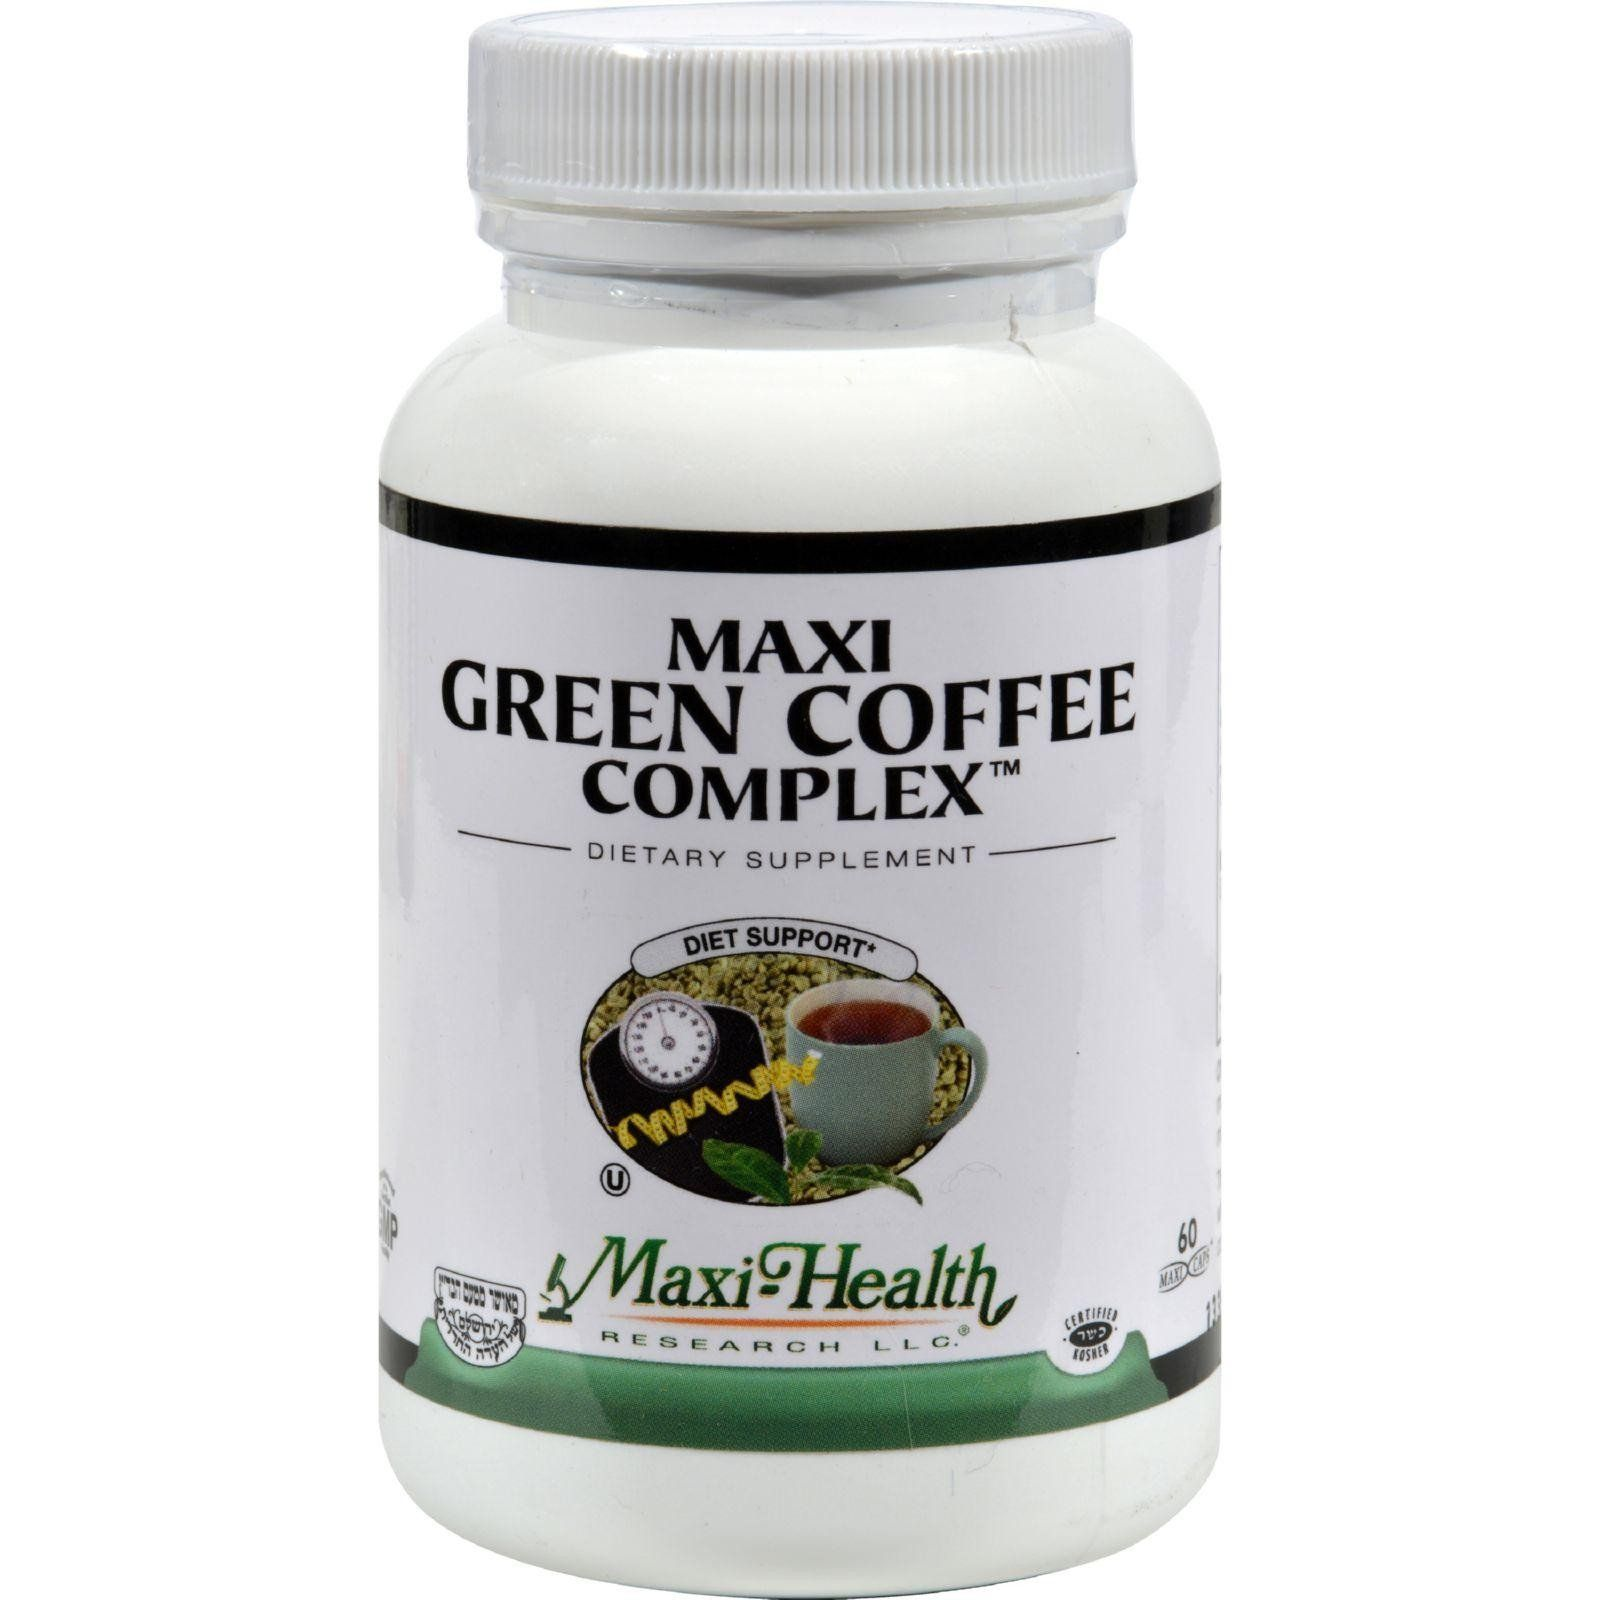 Maxi Health Kosher Vitamins Maxi Green Coffee Complex 60